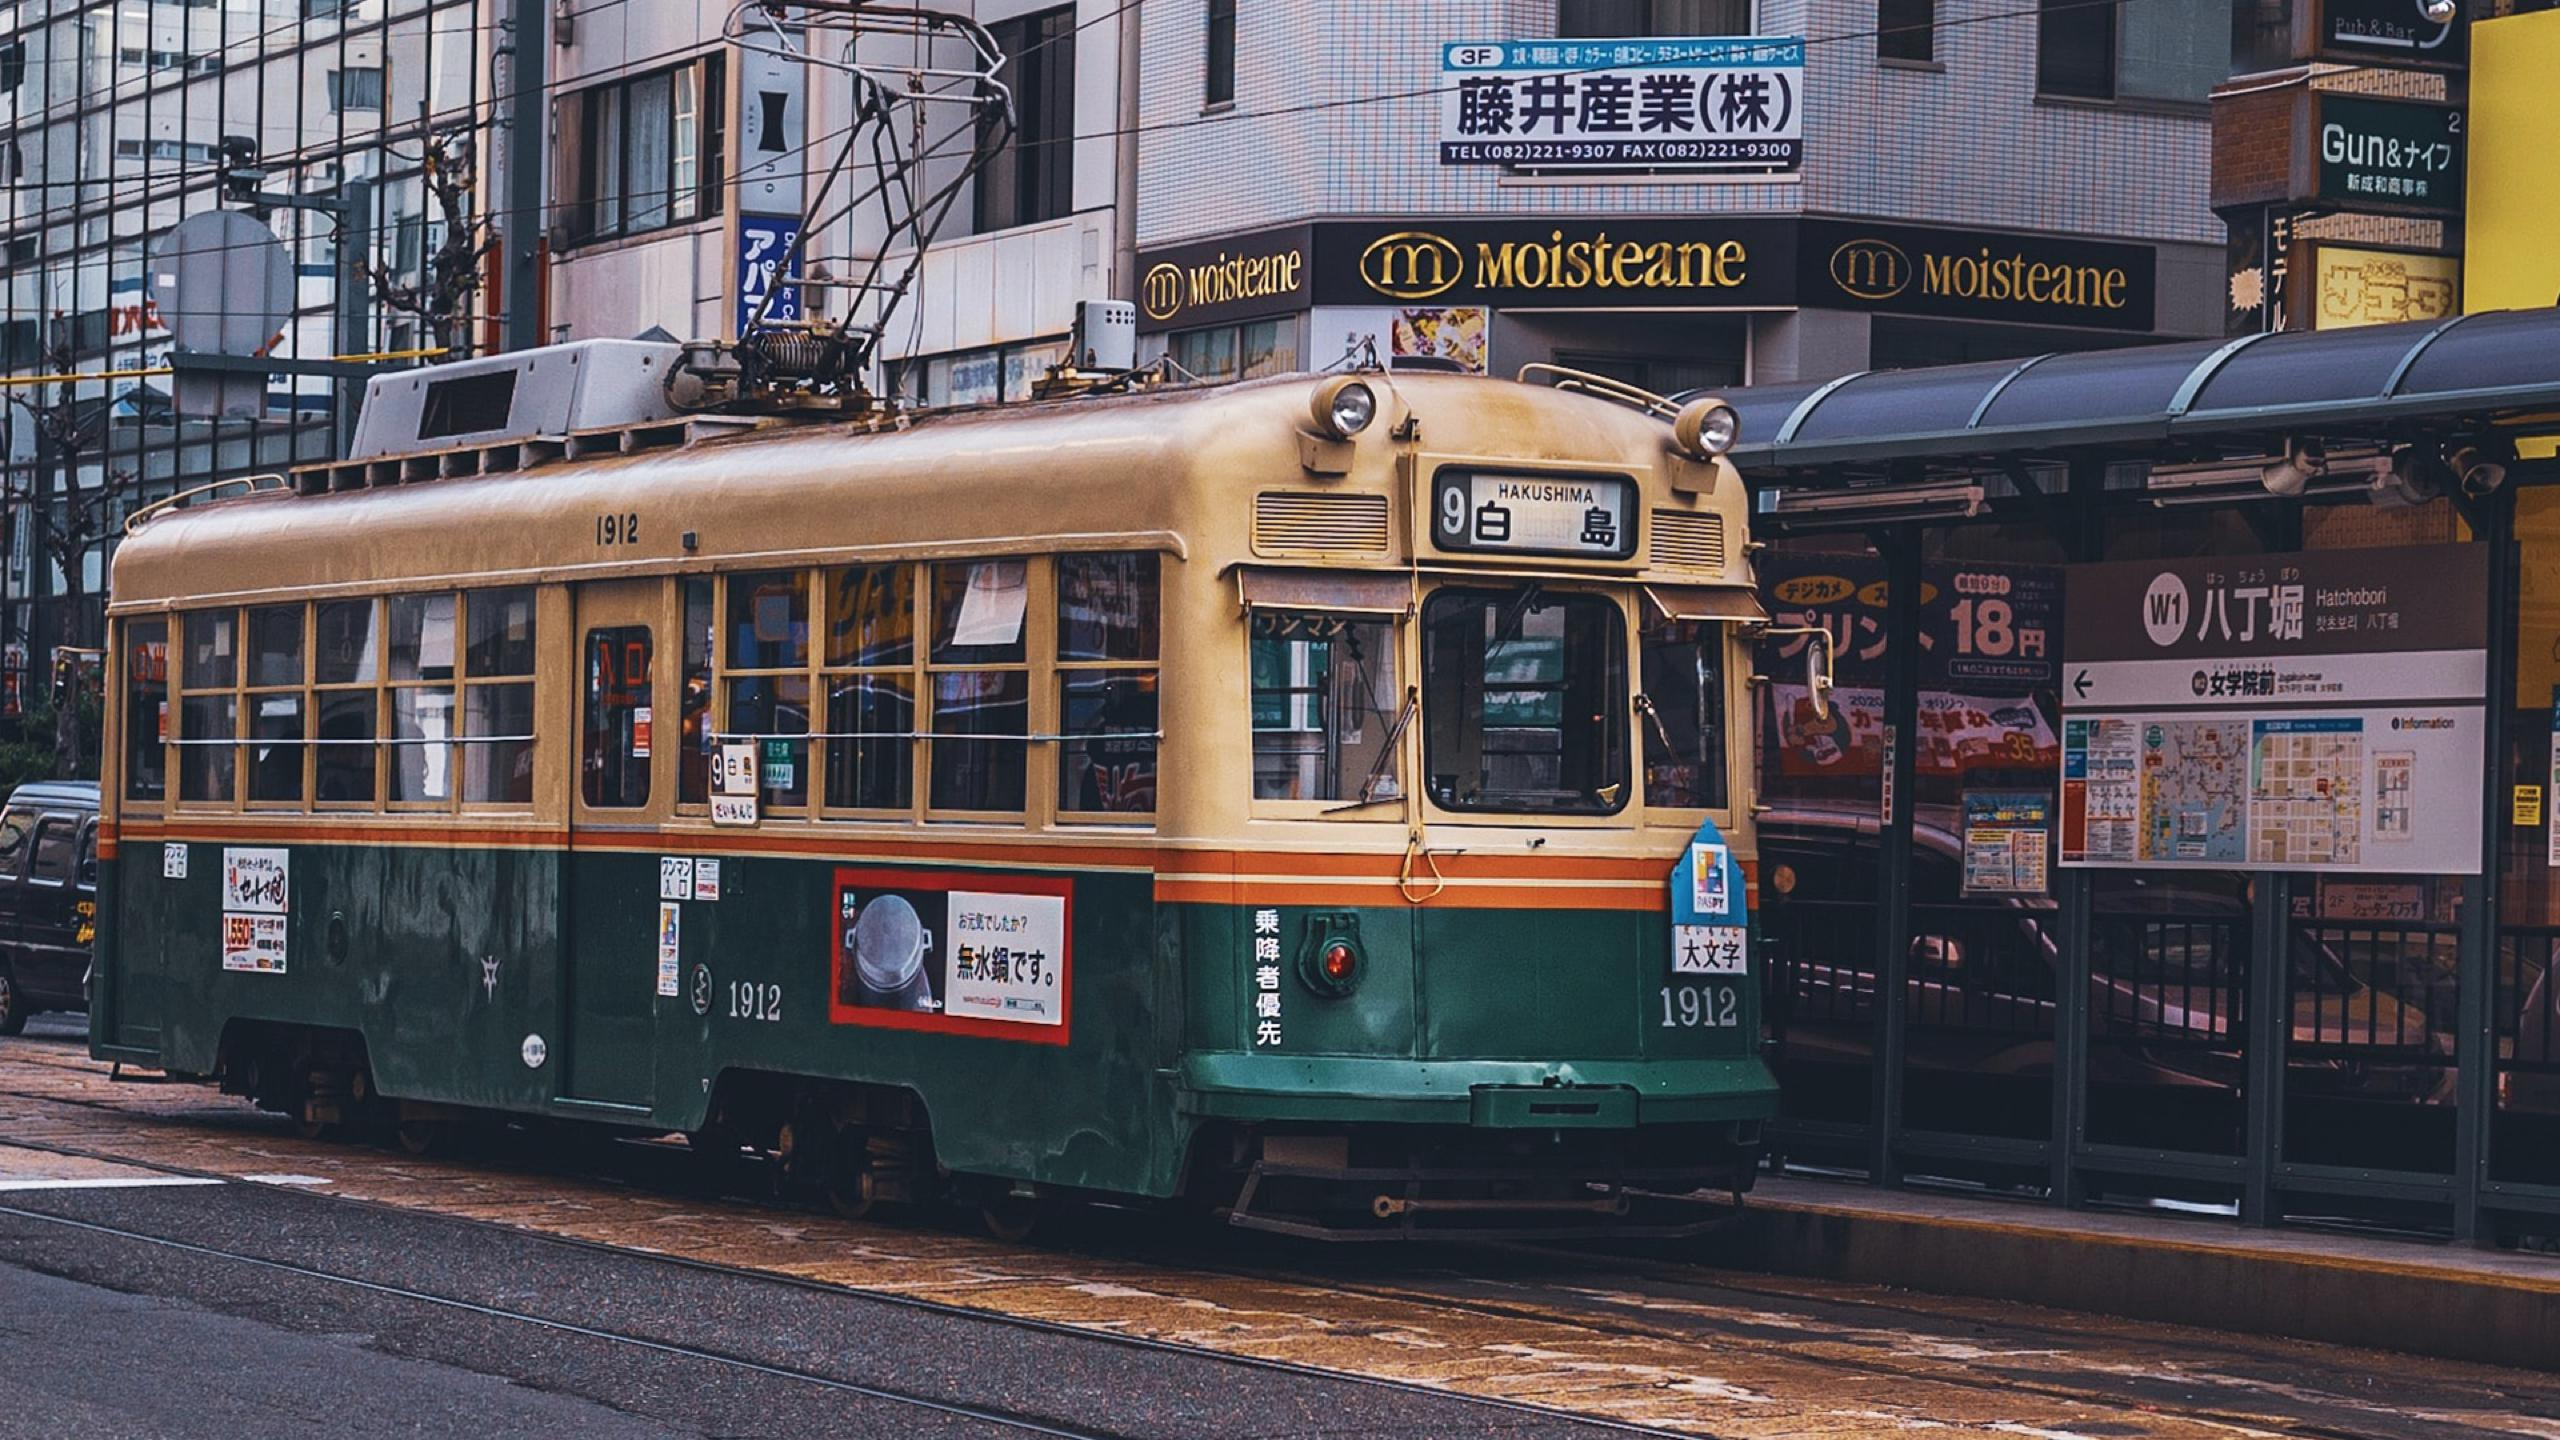 KOKO HOTEL 広島駅前|TOP用画像|KOKO HOTEL 広島駅前